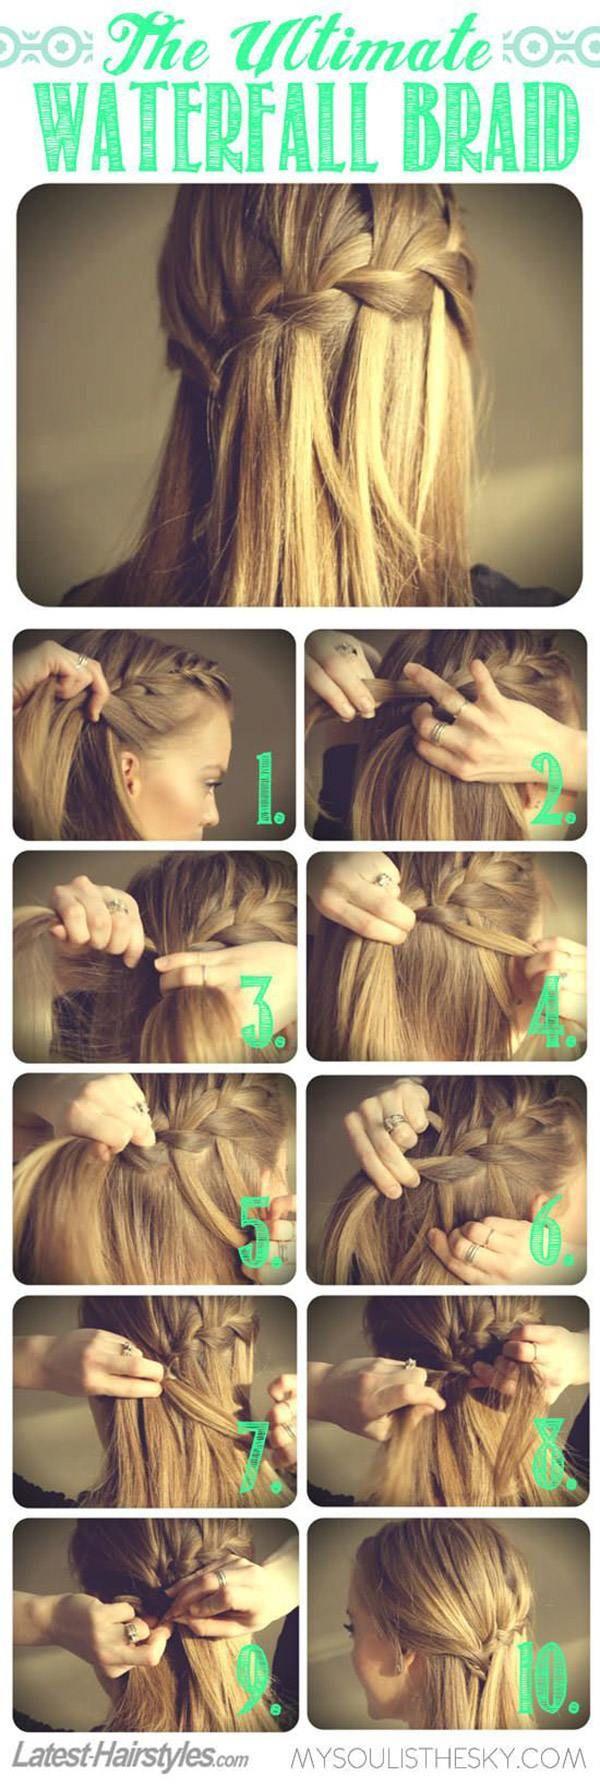 Pretty Braided Crown Hairstyle Tutorials and Ideas / http://www.himisspuff.com/easy-diy-braided-hairstyles-tutorials/9/